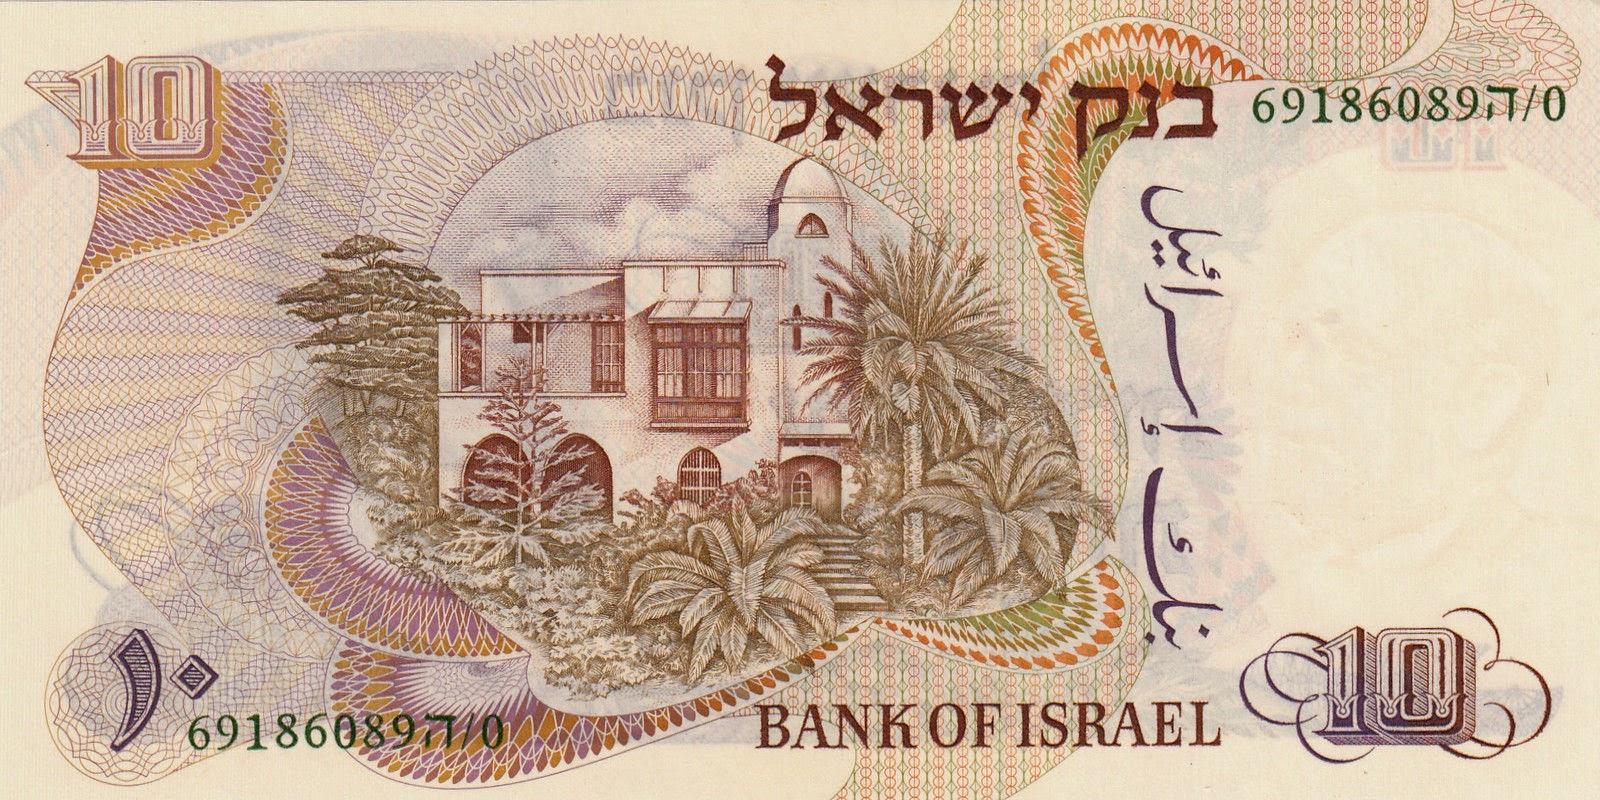 Israel Banknotes 10 Israeli Pounds 1968 Bialik's home in Tel-Aviv